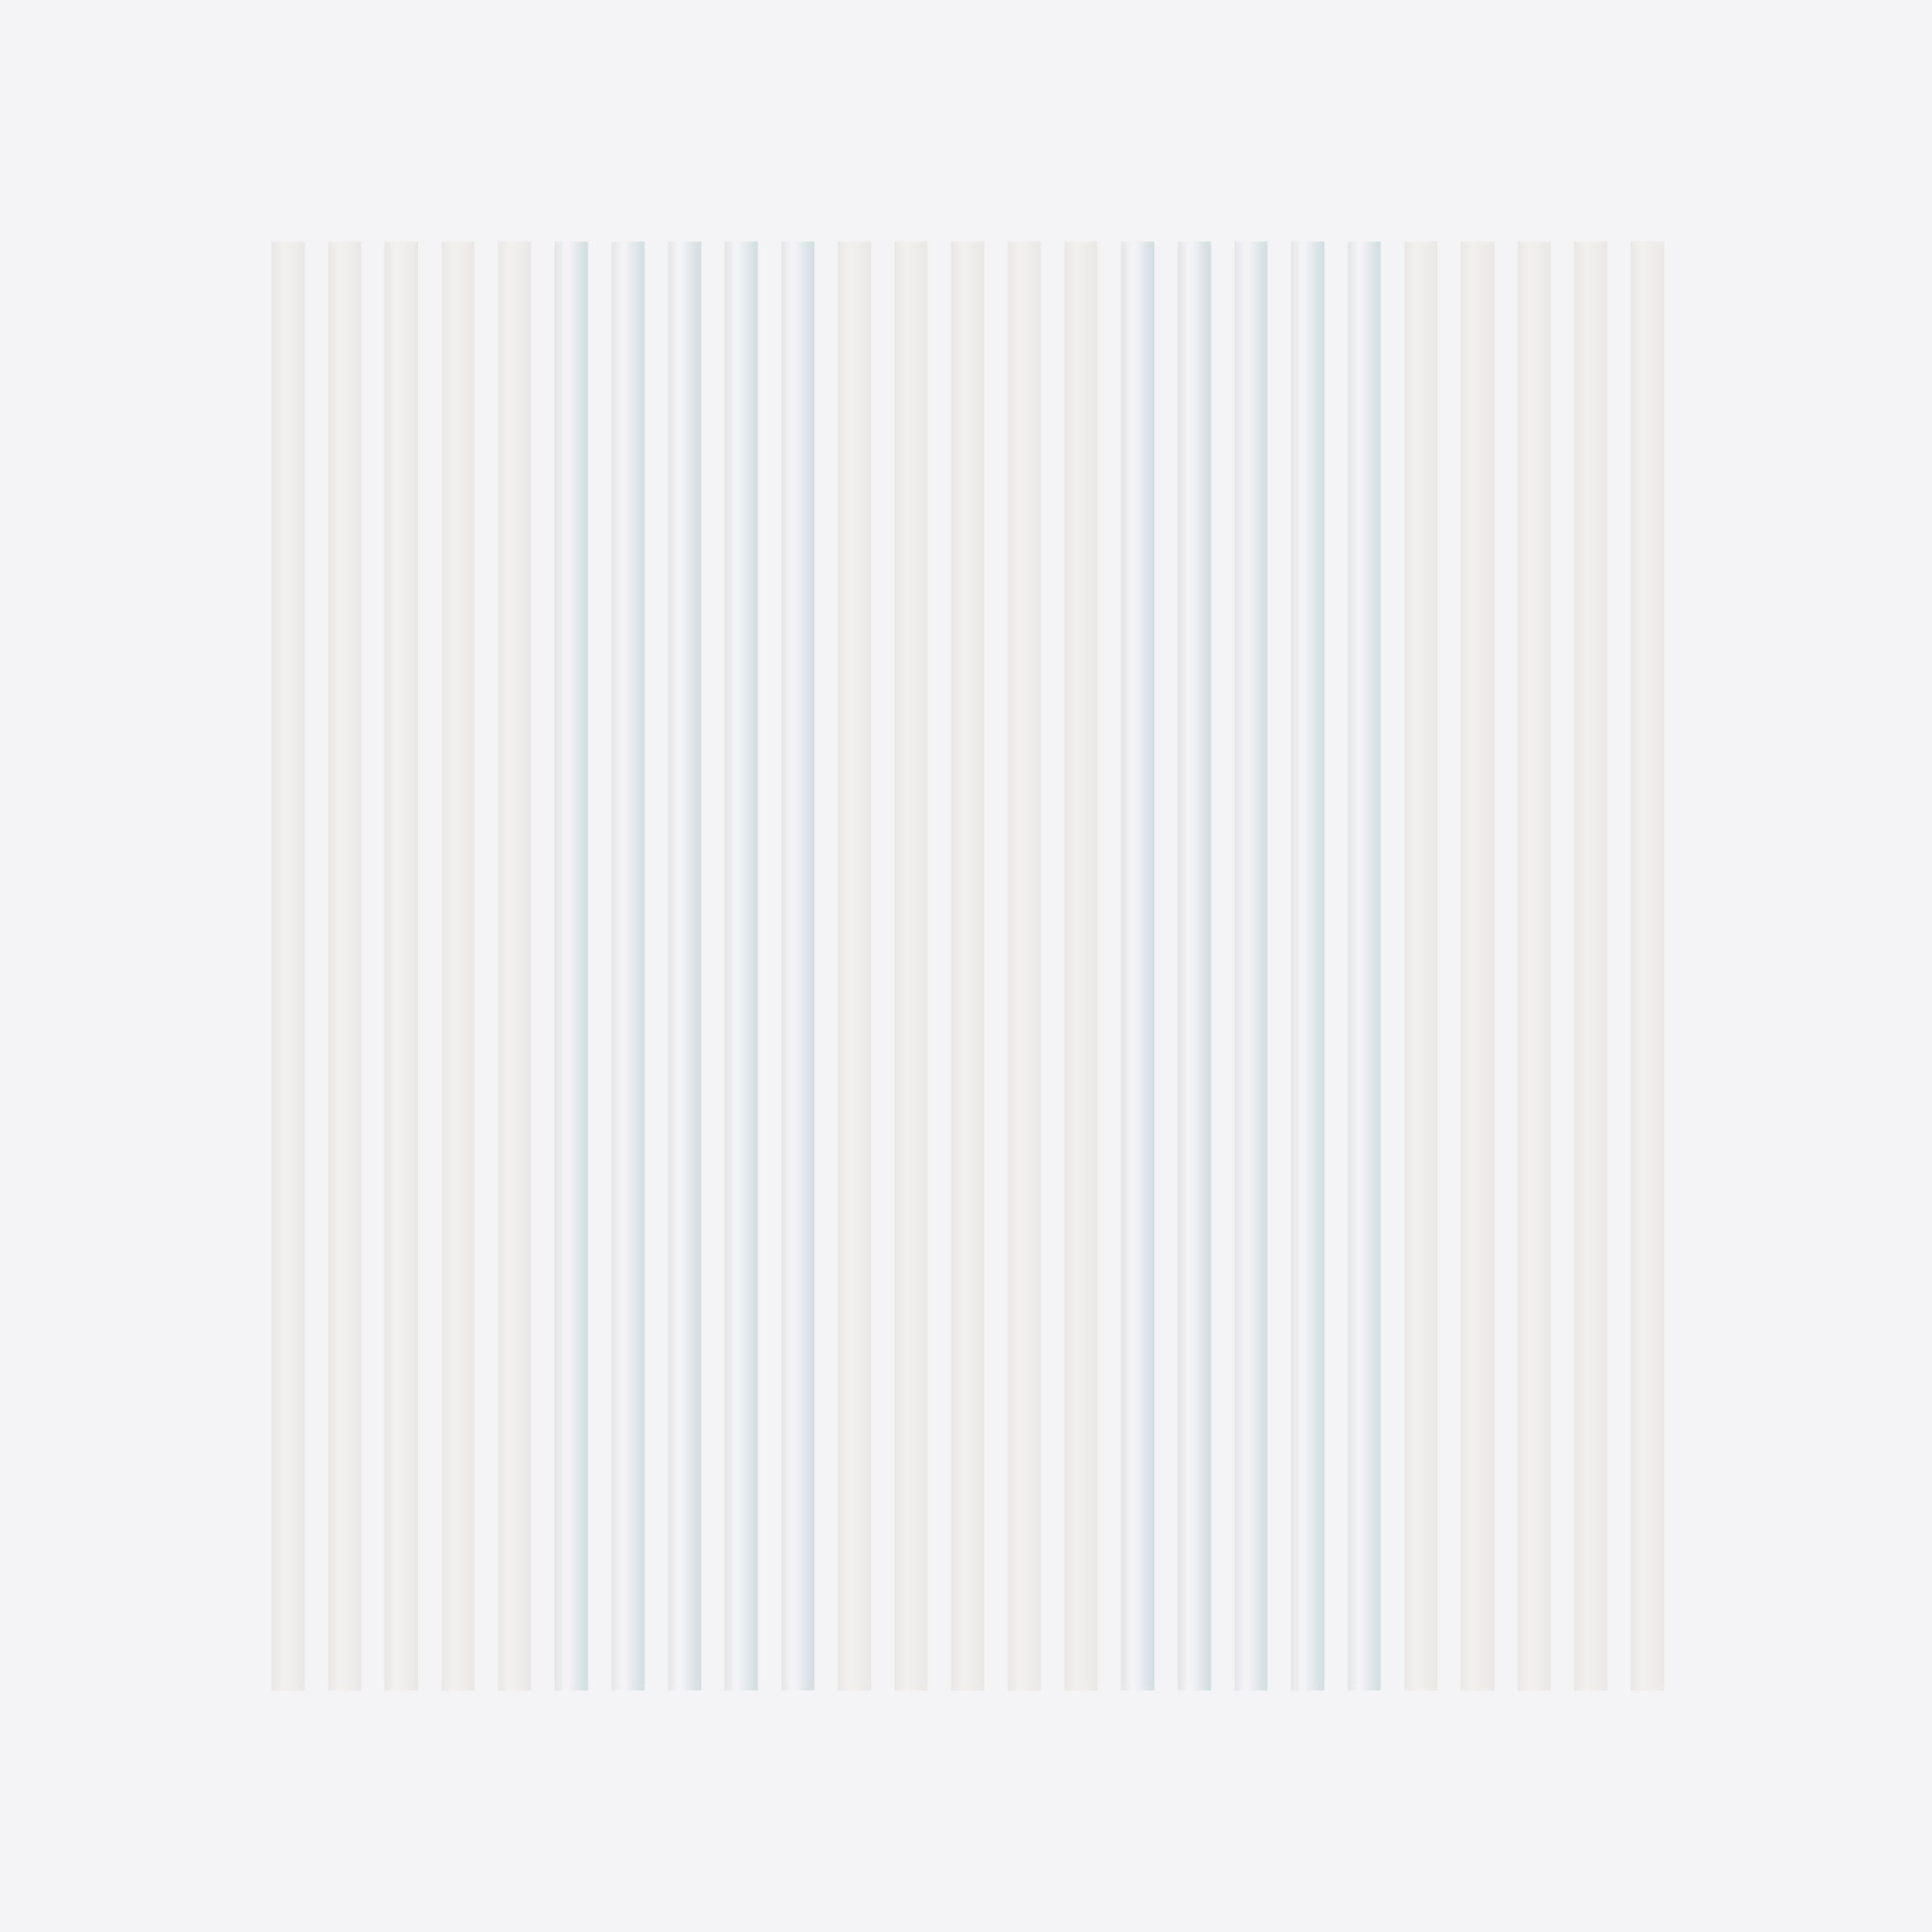 Kunststof draadgordijn Hilo transparant, wit